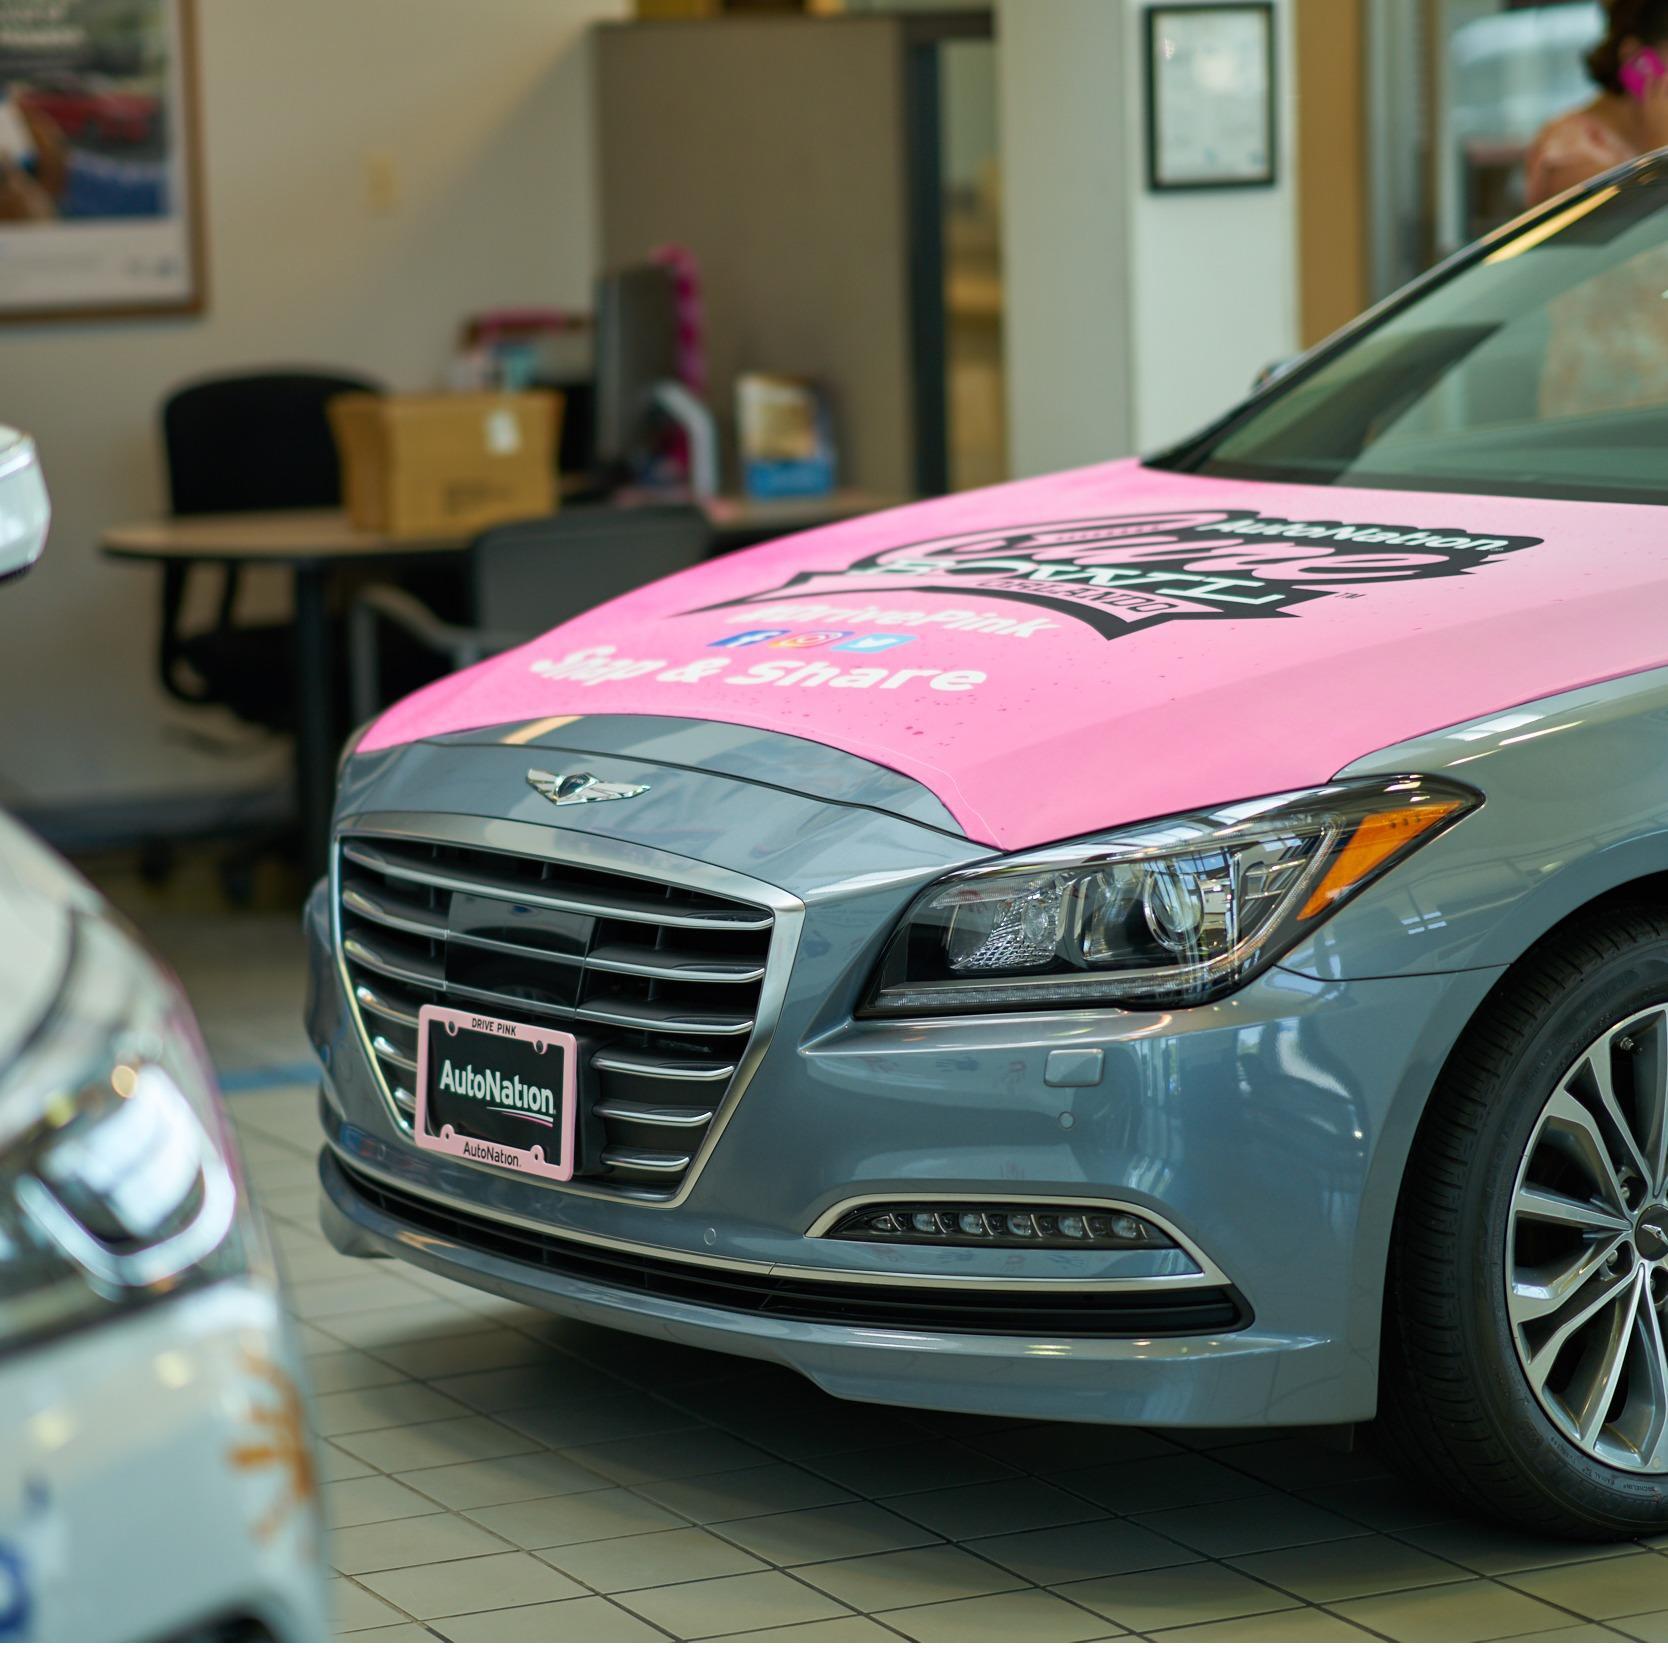 autonation mis Costa mesa, ca new, autonation honda costa mesa sells and services honda  vehicles in the greater costa mesa area.